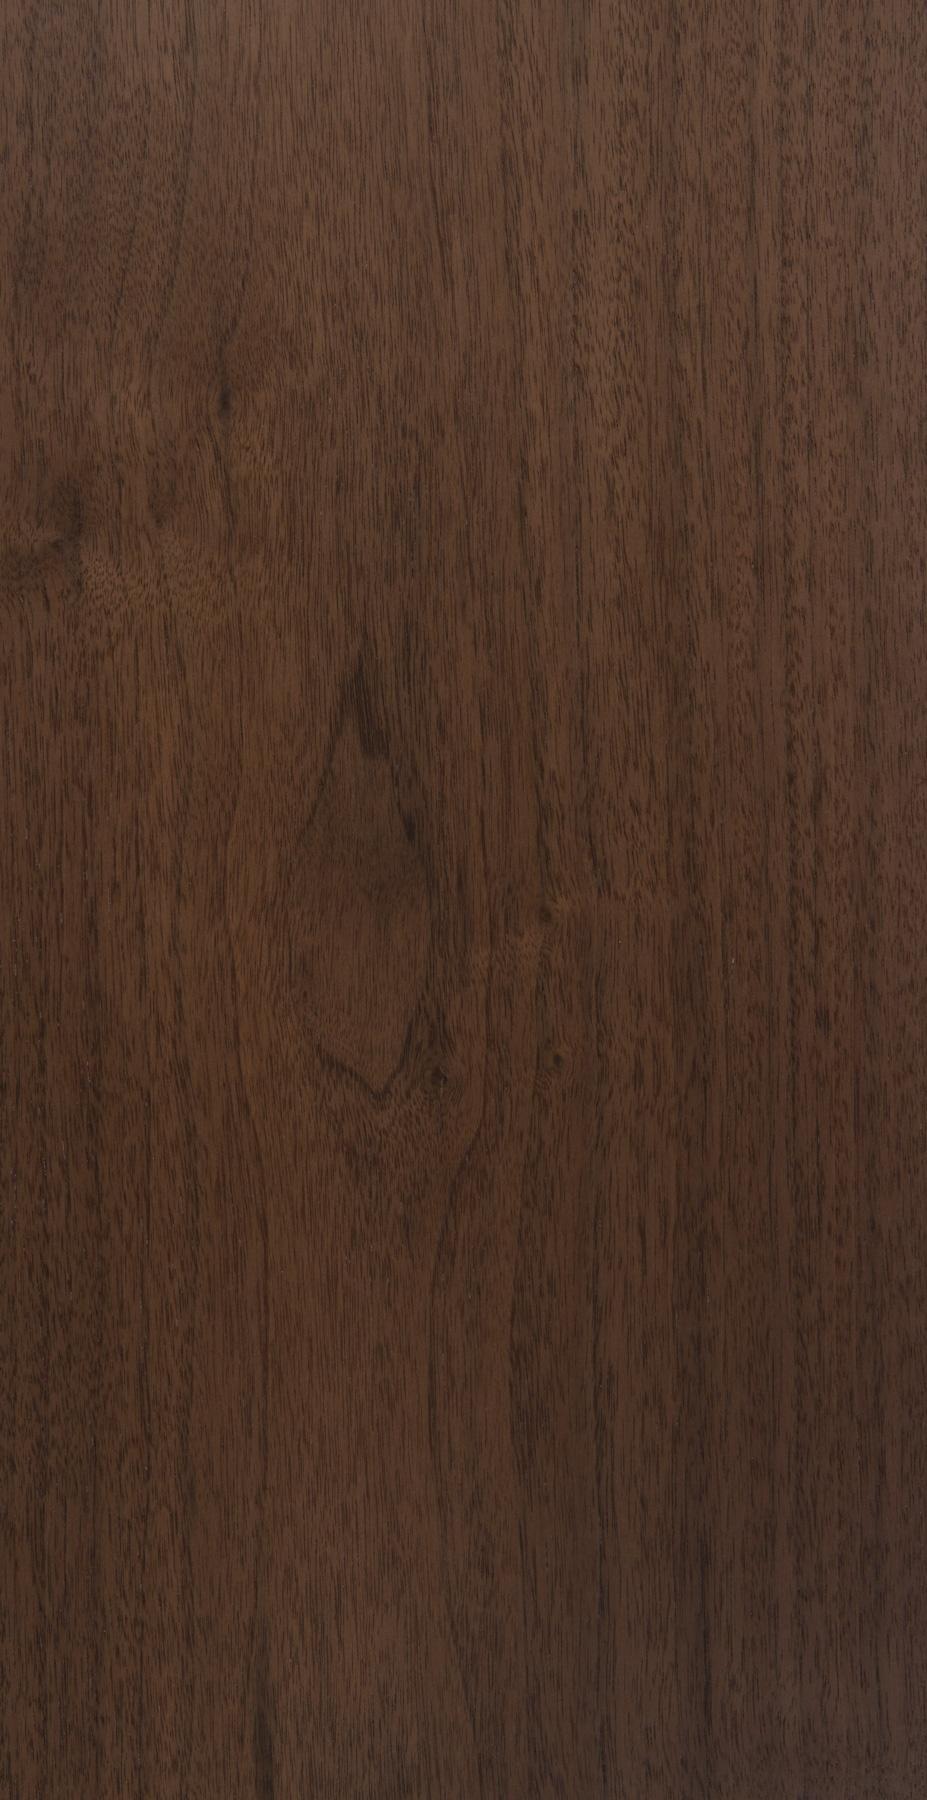 maderas-terramont-true-toro-american-walnut-cepillado